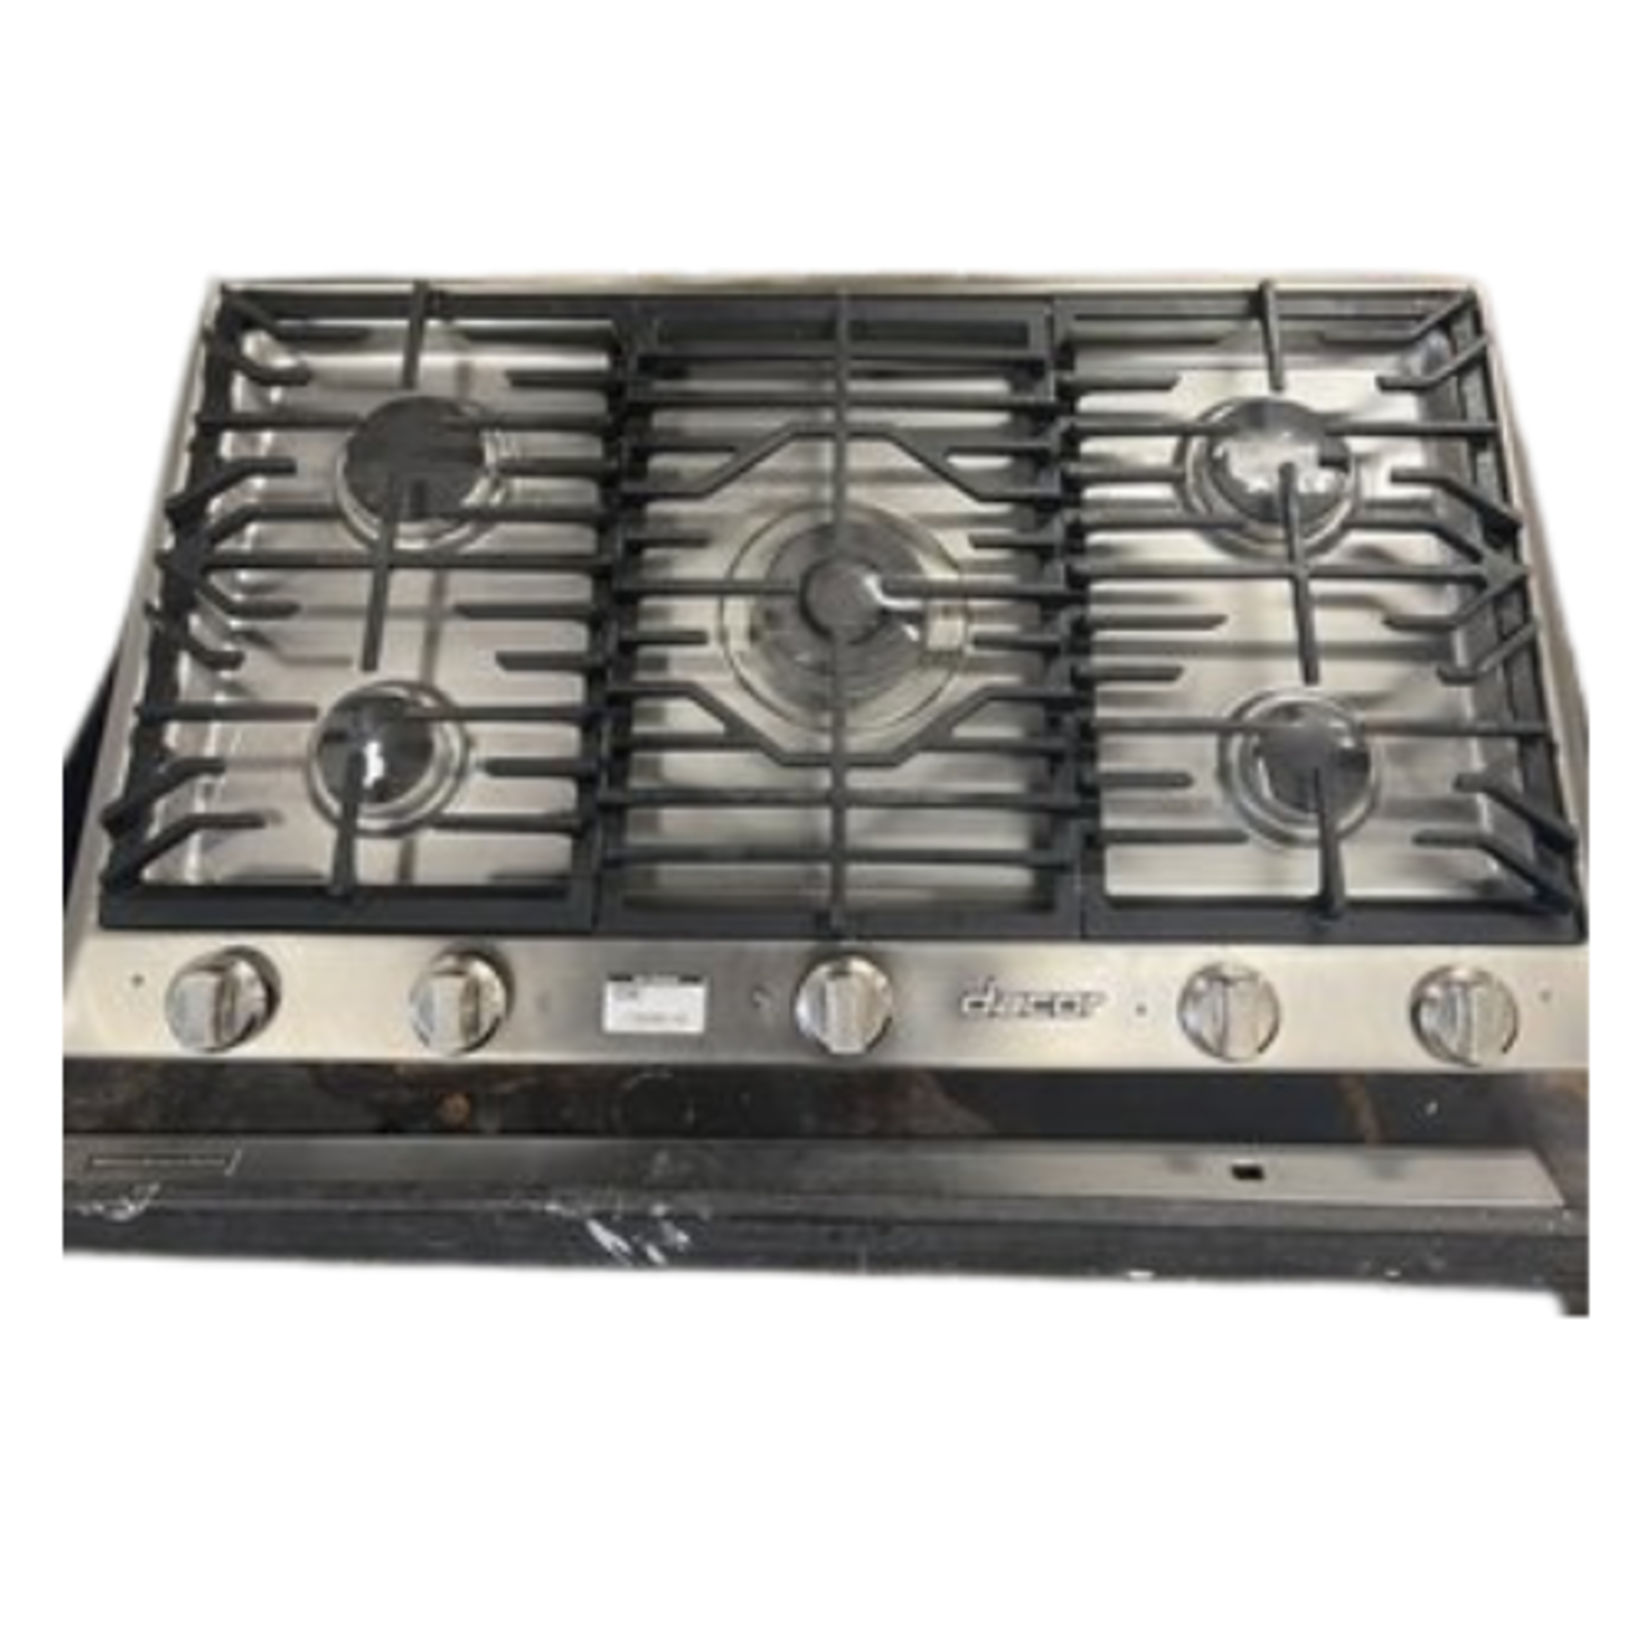 10143 Lightly Used Dacor 5-Burner Drop In Cooktop